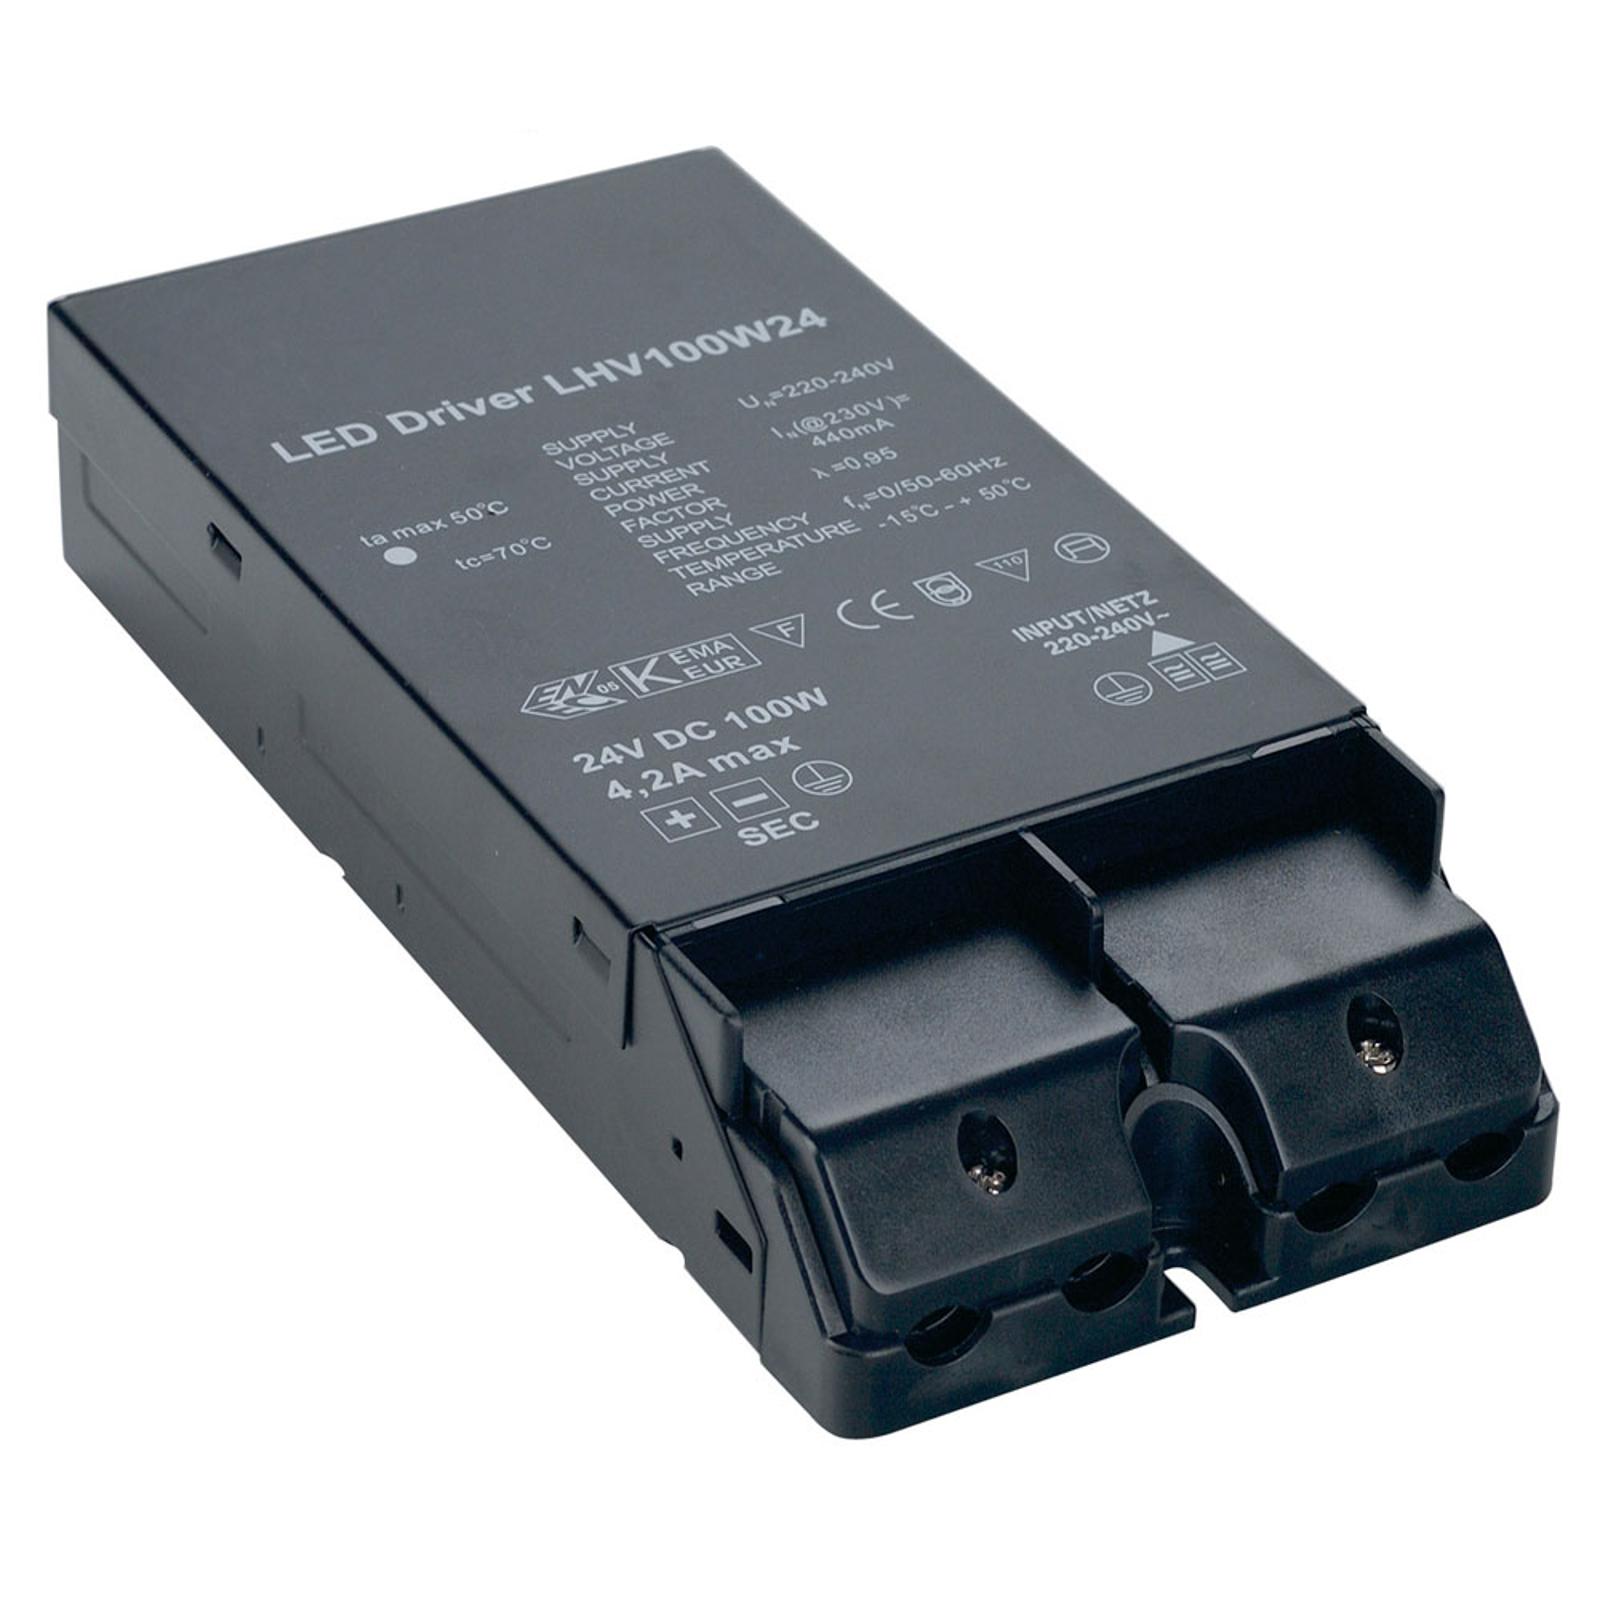 SLV LED NETZTEIL 100W 24V